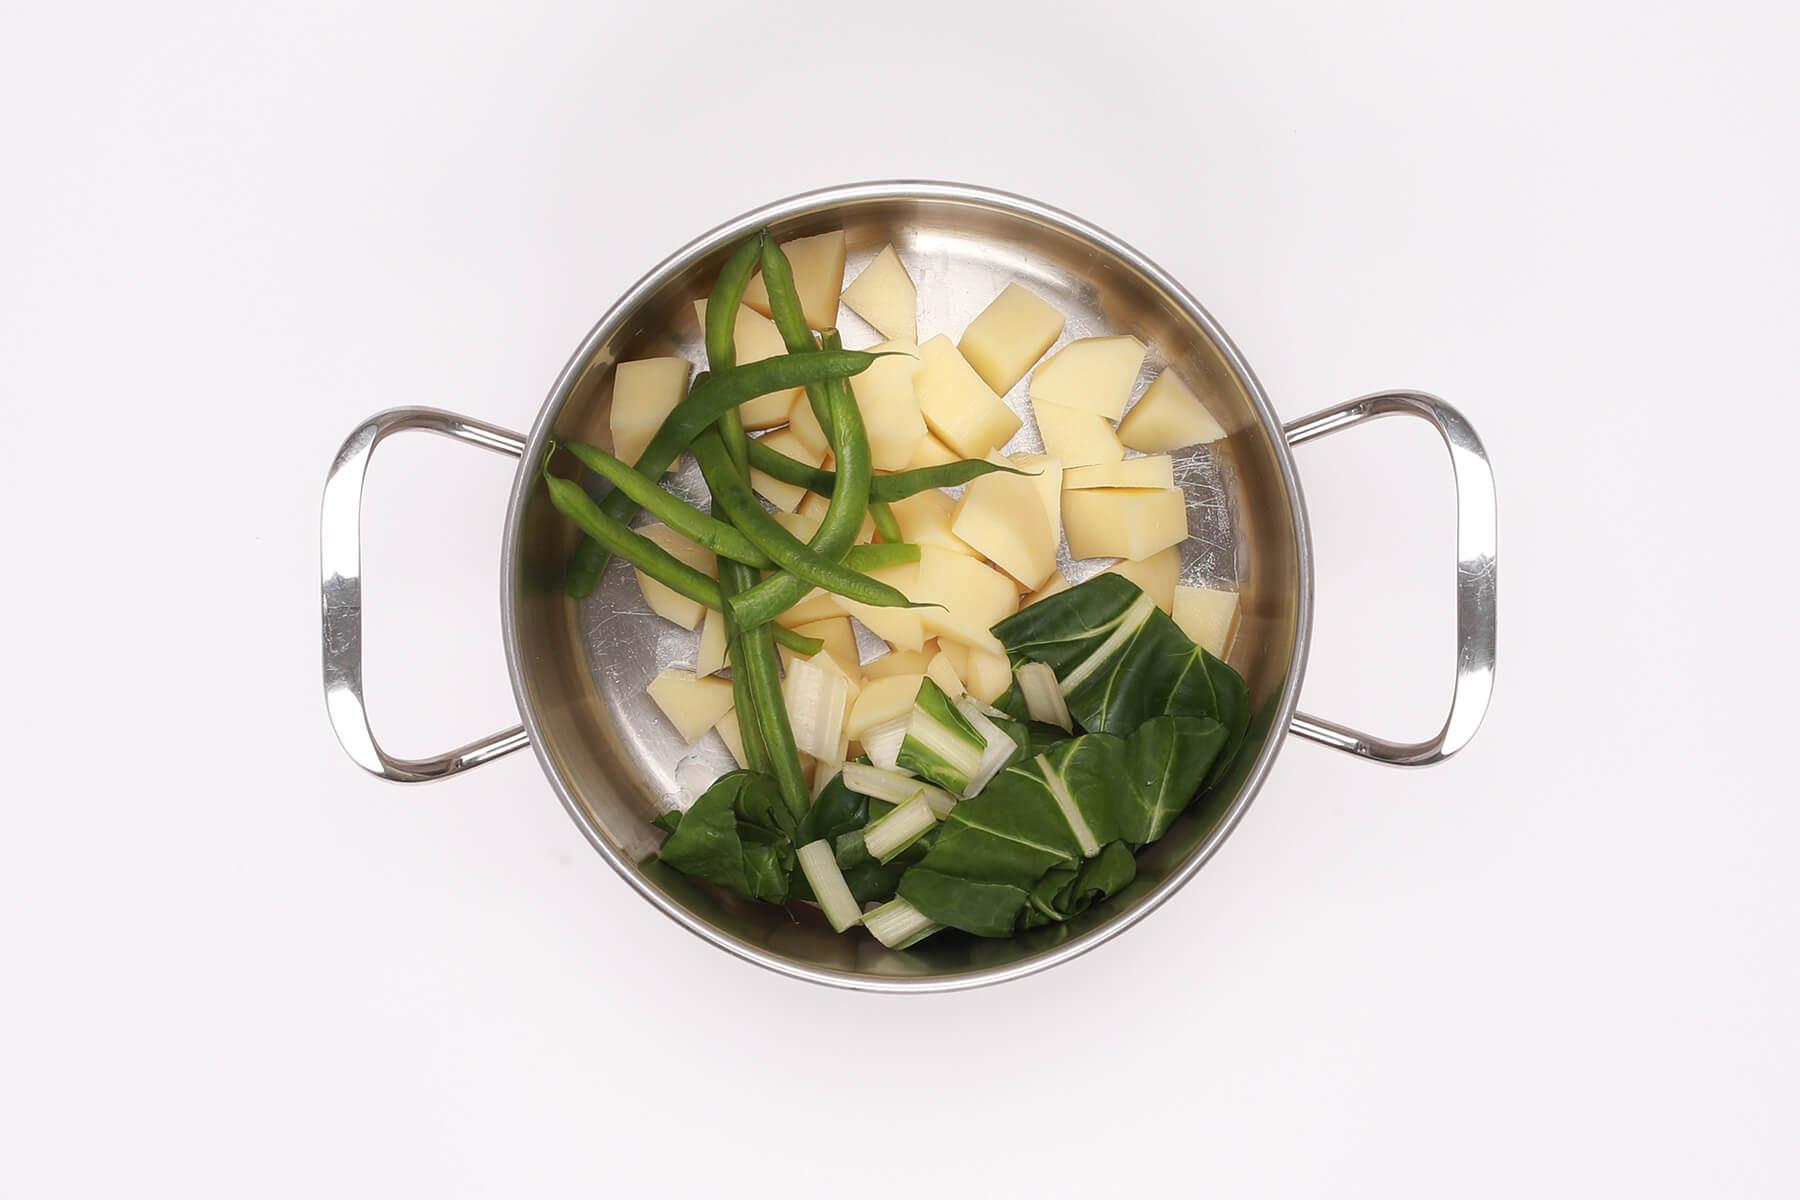 Bollire verdure Ricetta pizzoccheri con coste - Ricette Pizzoccheri